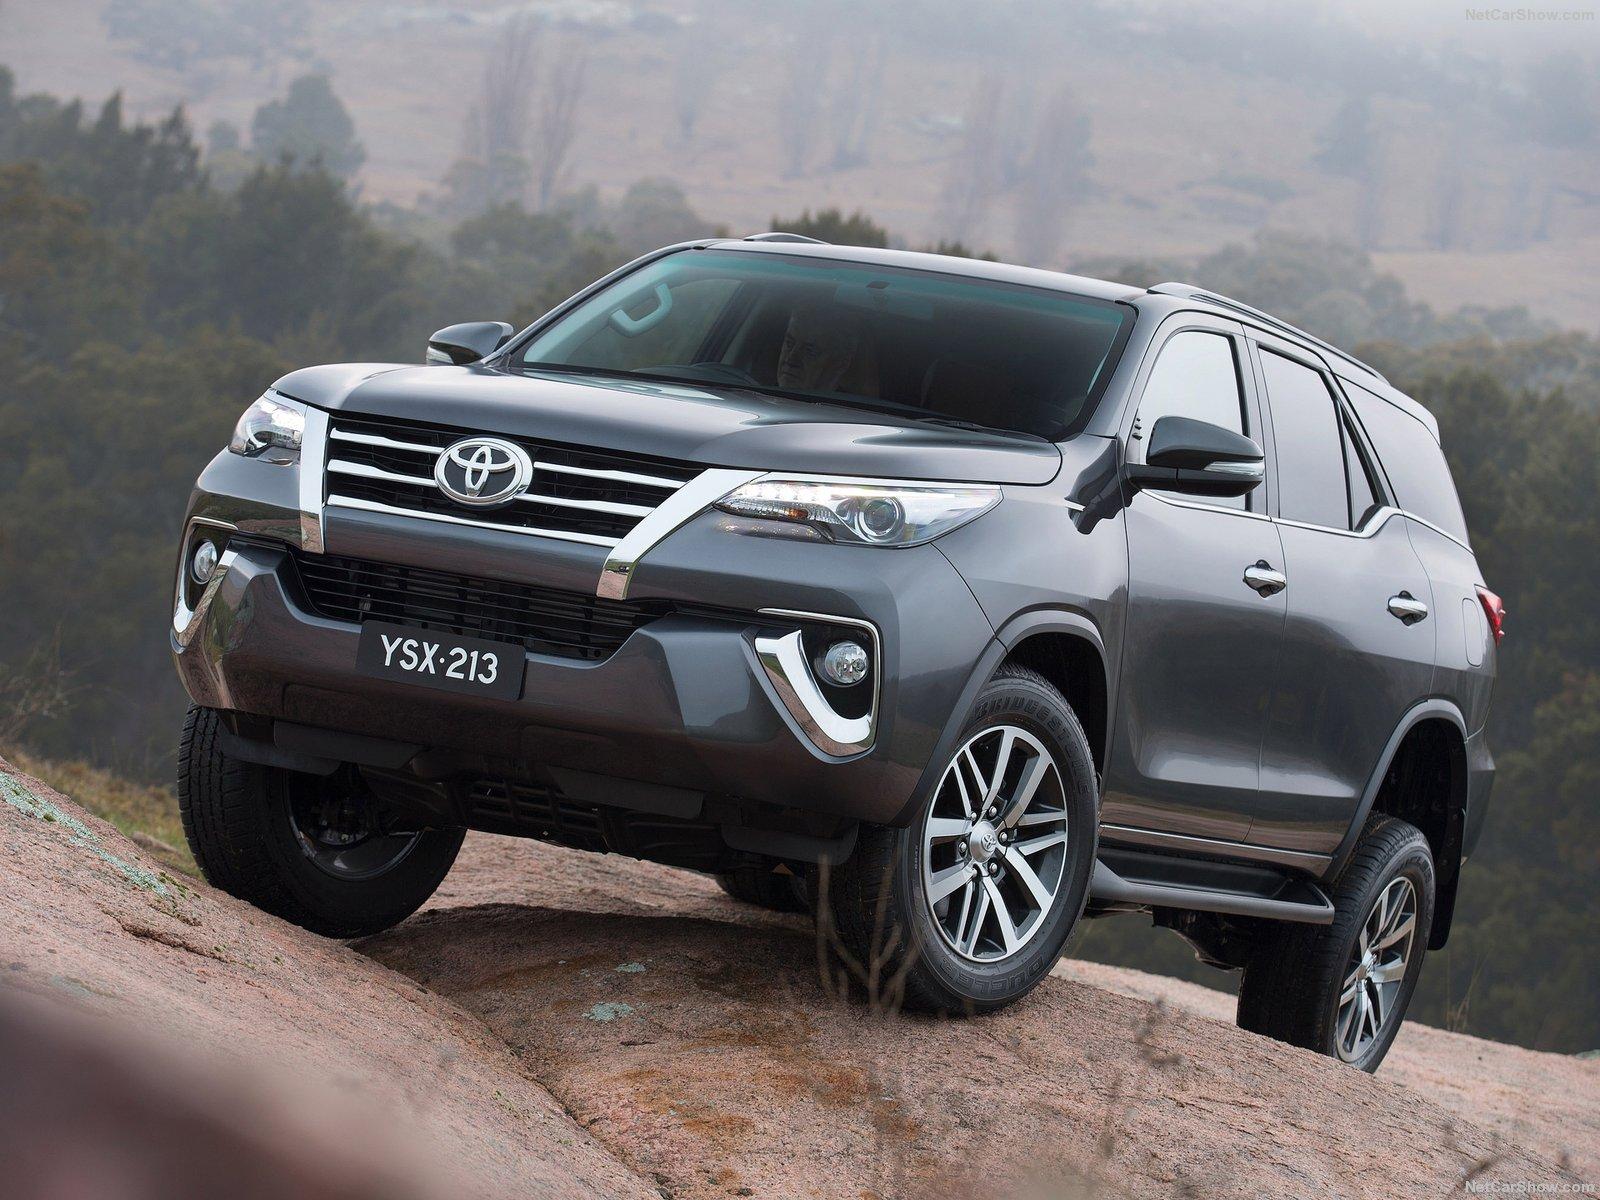 Description: http://2.bp.blogspot.com/-xqR8QZKk_VE/Vadn0MHzzDI/AAAAAAAA0ys/itXTbLWsjdg/s1600/2016-Toyota-Fortuner-1.jpg